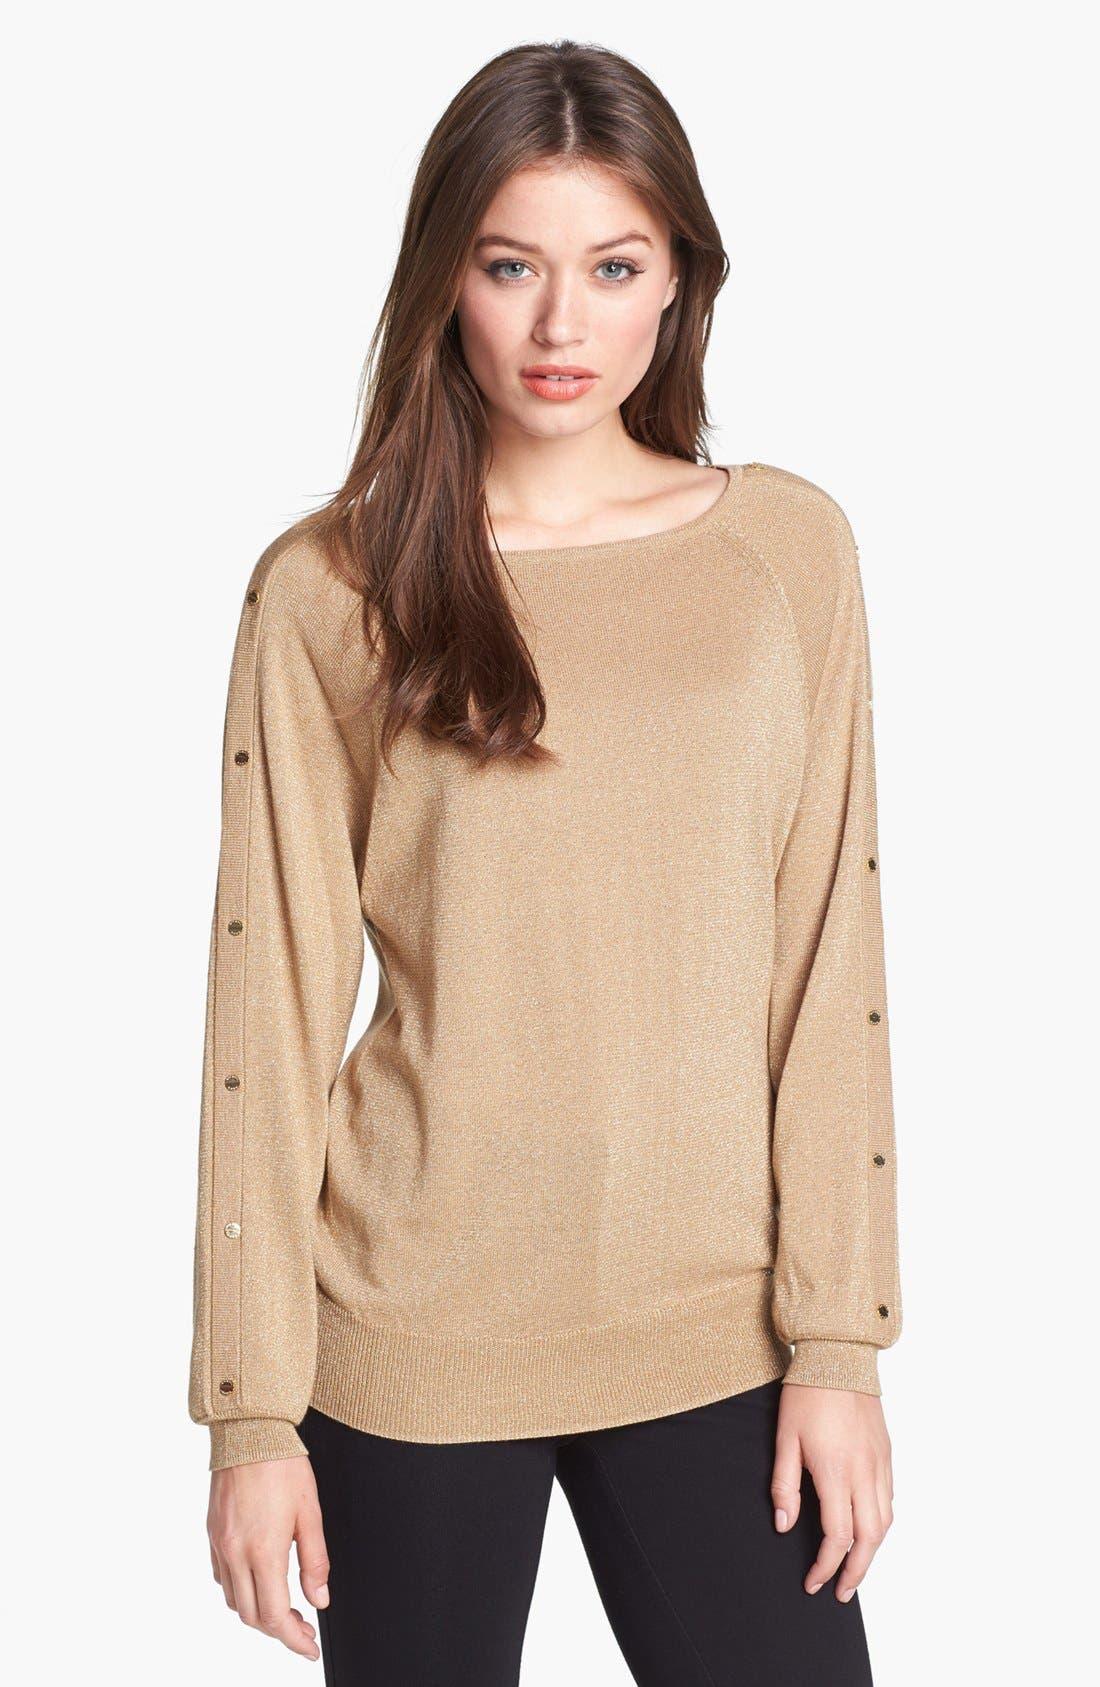 Alternate Image 1 Selected - MICHAEL Michael Kors Studded Sleeve Metallic Sweater (Regular & Petite)